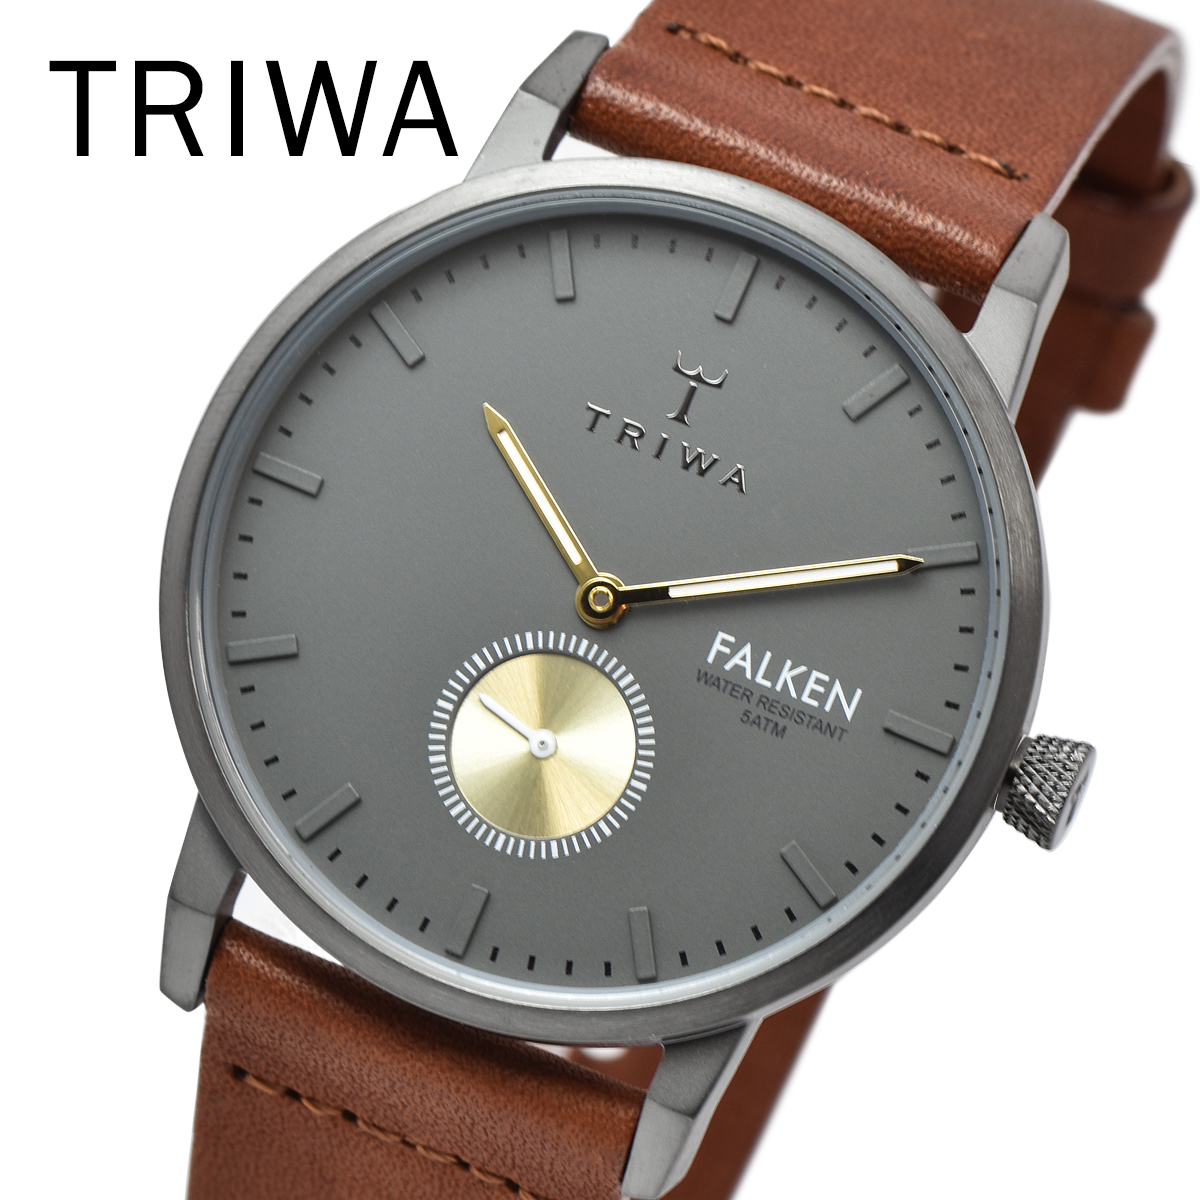 TRIWA トリワ FAST102-CL010213 WALTER FALKEN BROWN メンズ レディース ユニセックス 時計 腕時計 プレゼント 贈り物 ギフト 彼氏 フォーマル カジュアル ペアウォッチ 北欧 特価[あす楽]